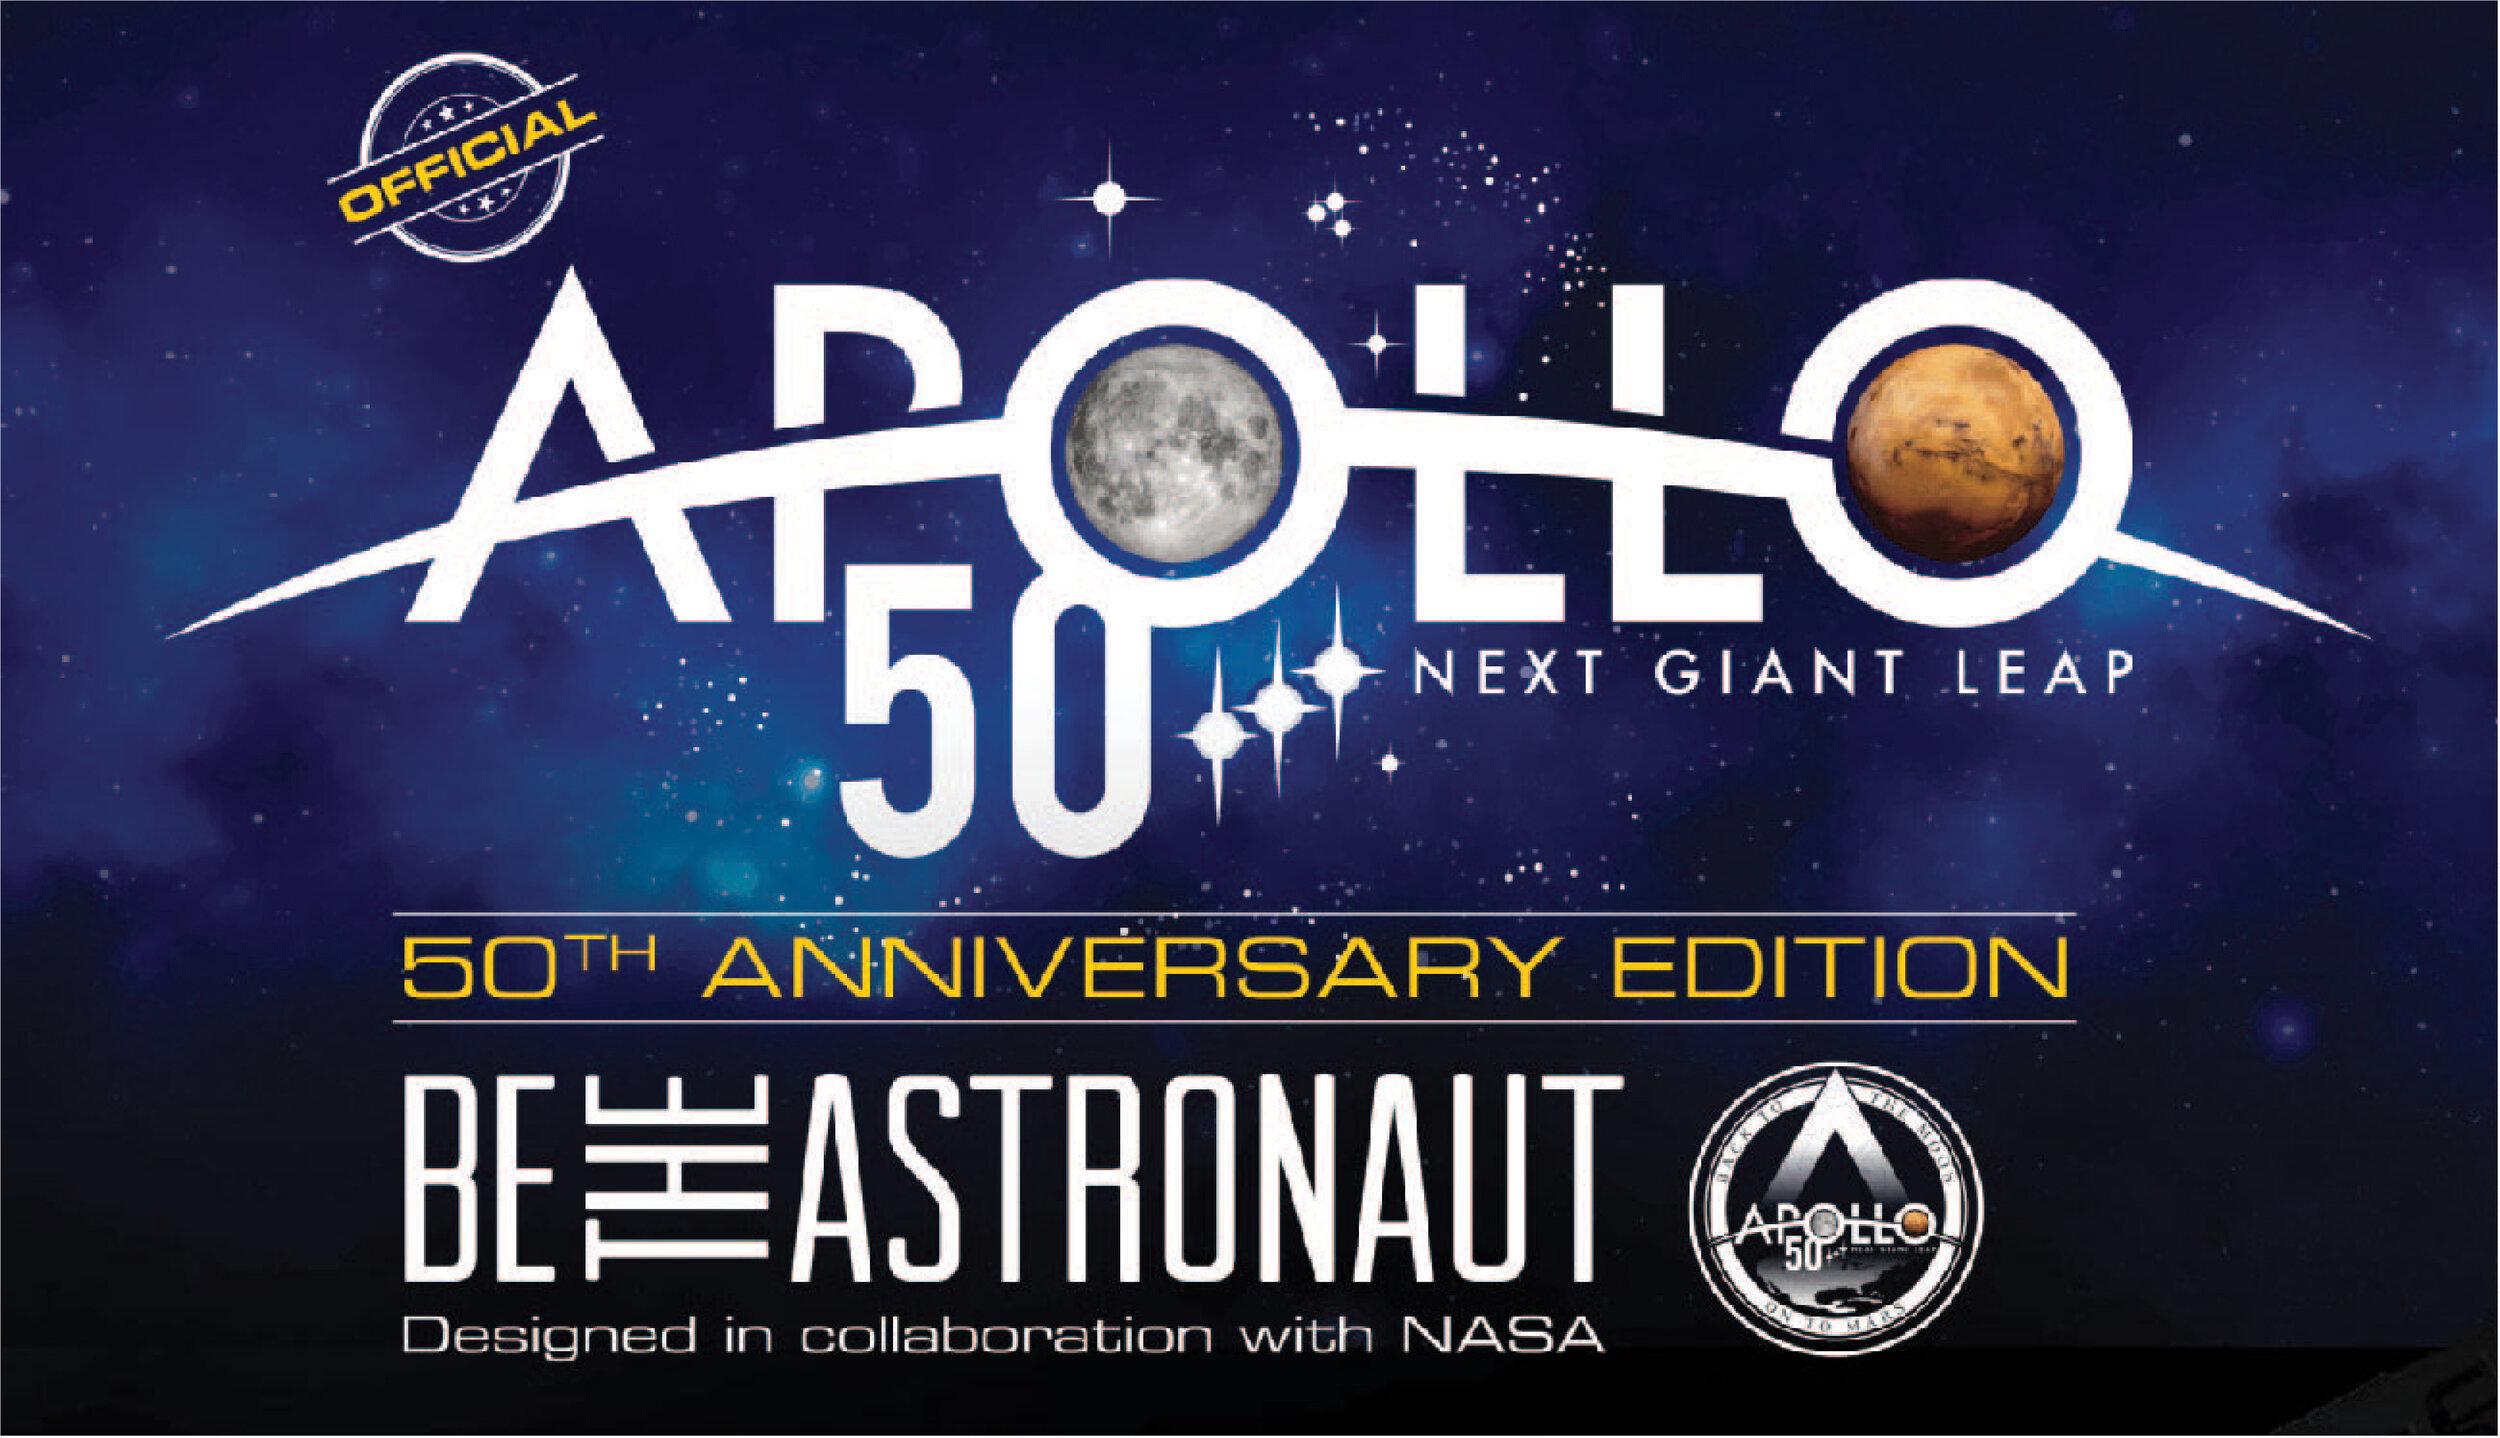 Be the Astronaut -  Apollo 50th Edition    Exhibit Brochure